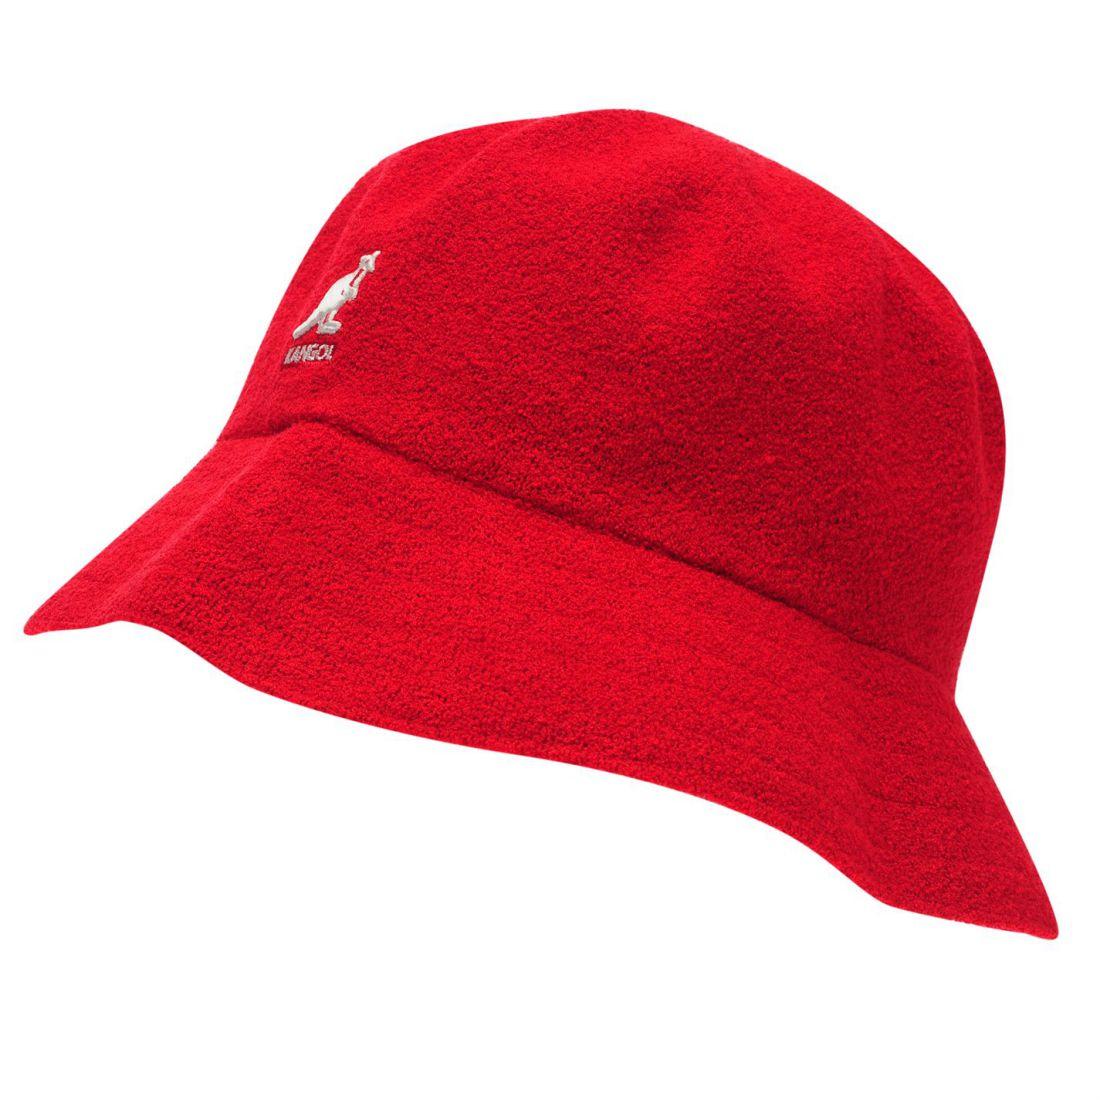 Image is loading Kangol-Boucle-Bucket-Hat-Mens-Gents db57c032edc8